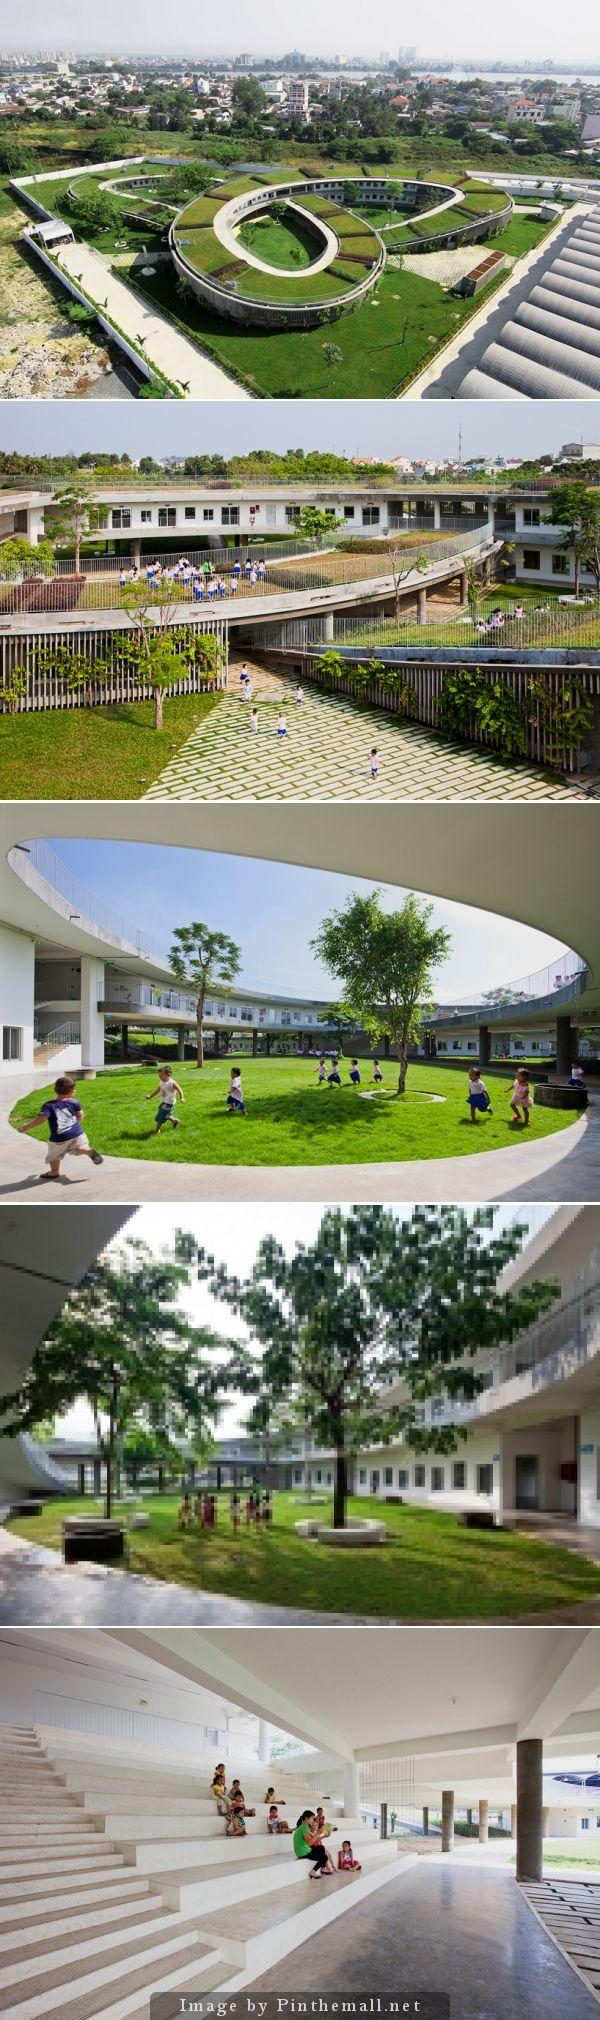 Kinder Garden: Vo Trong Nghia Farming Kindergarten, Vietnam